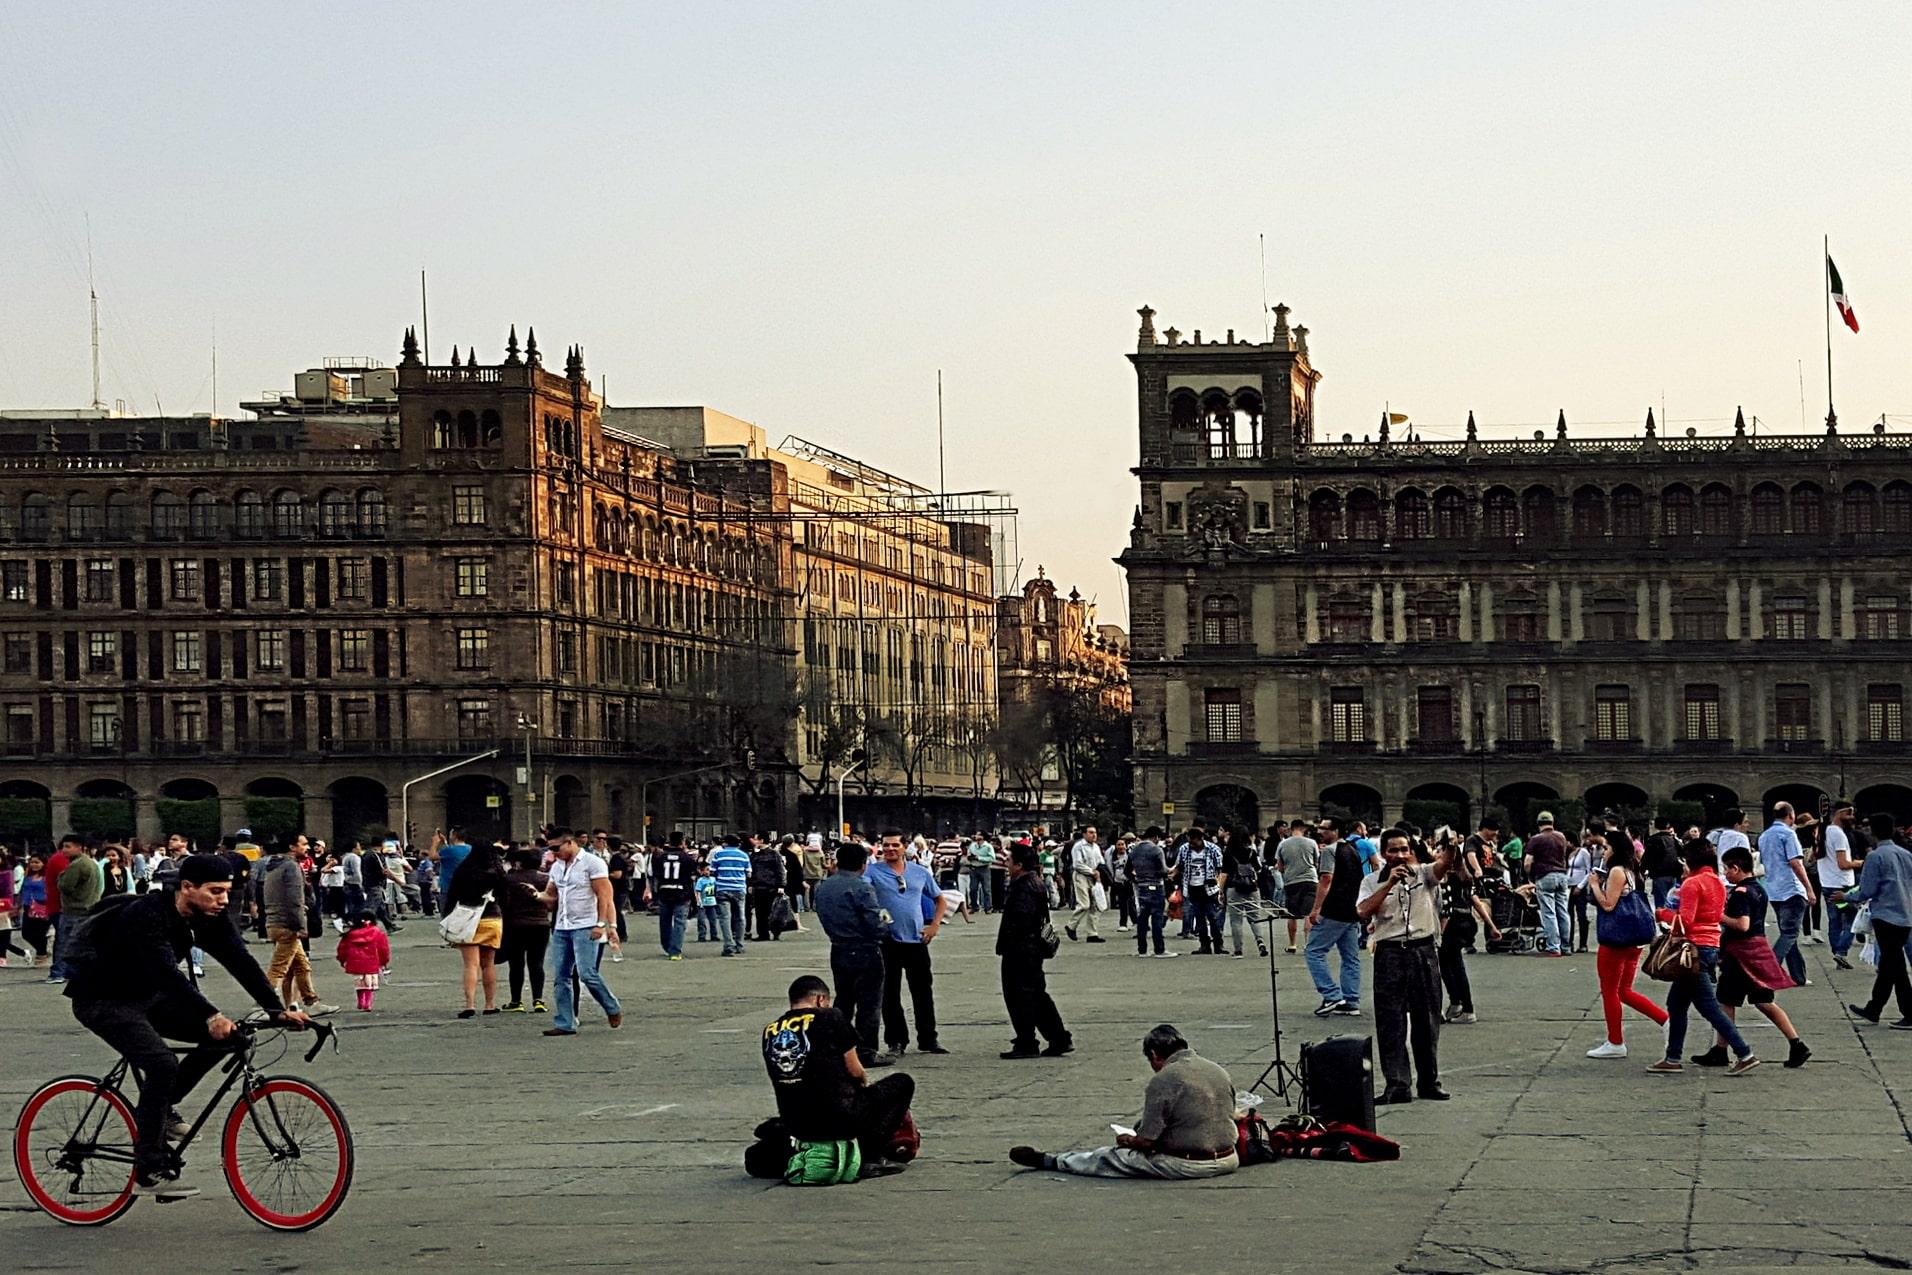 Zocalo in Mexico City